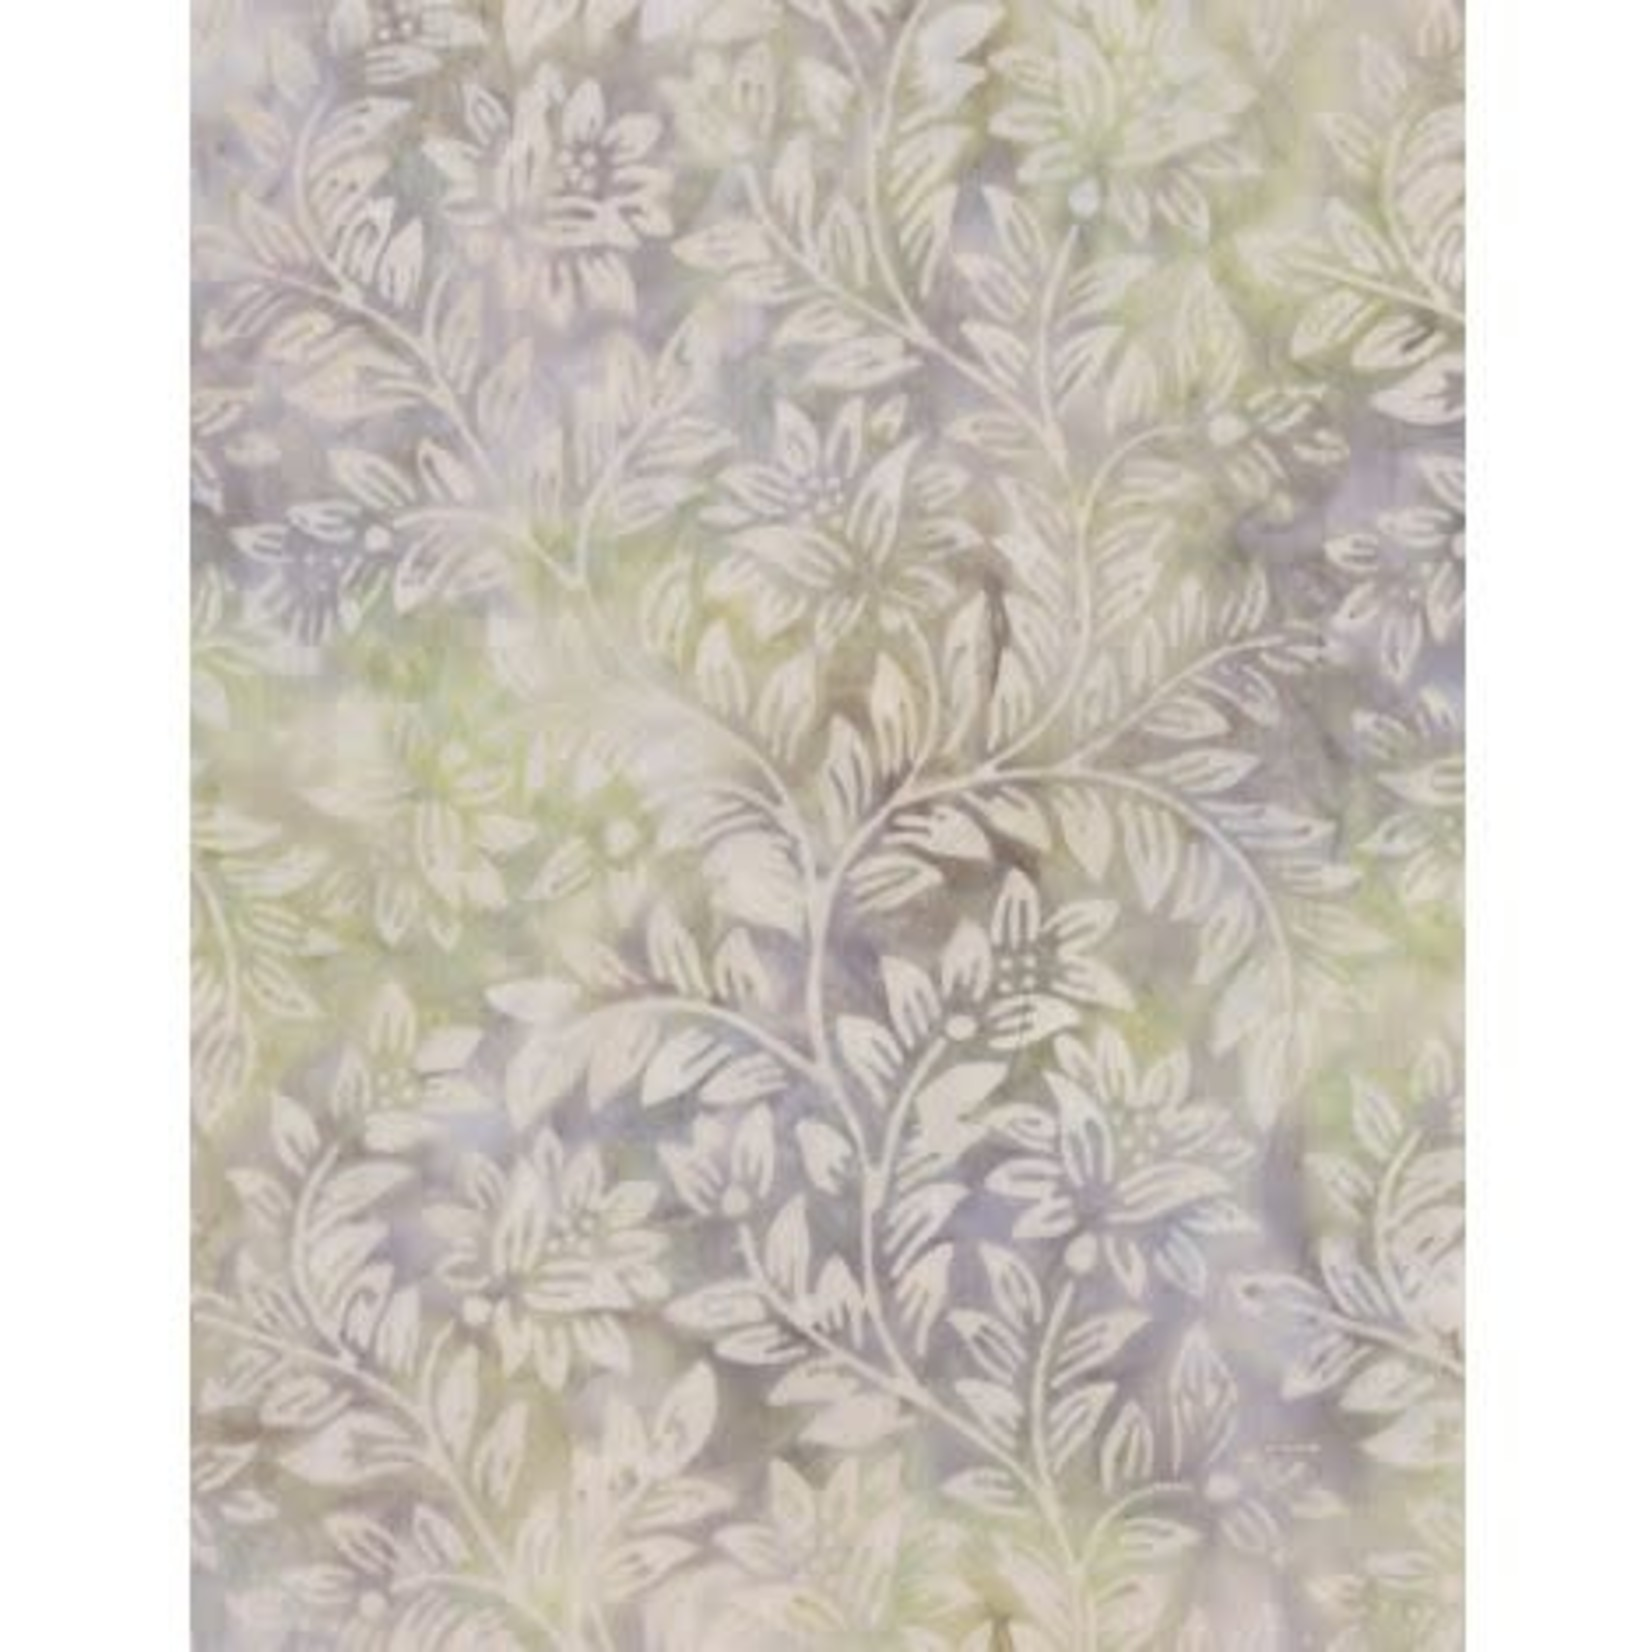 Wilmington Prints Ribbon Candy, Floral Vine Tan, Fabric E, Per Cm or $20/m